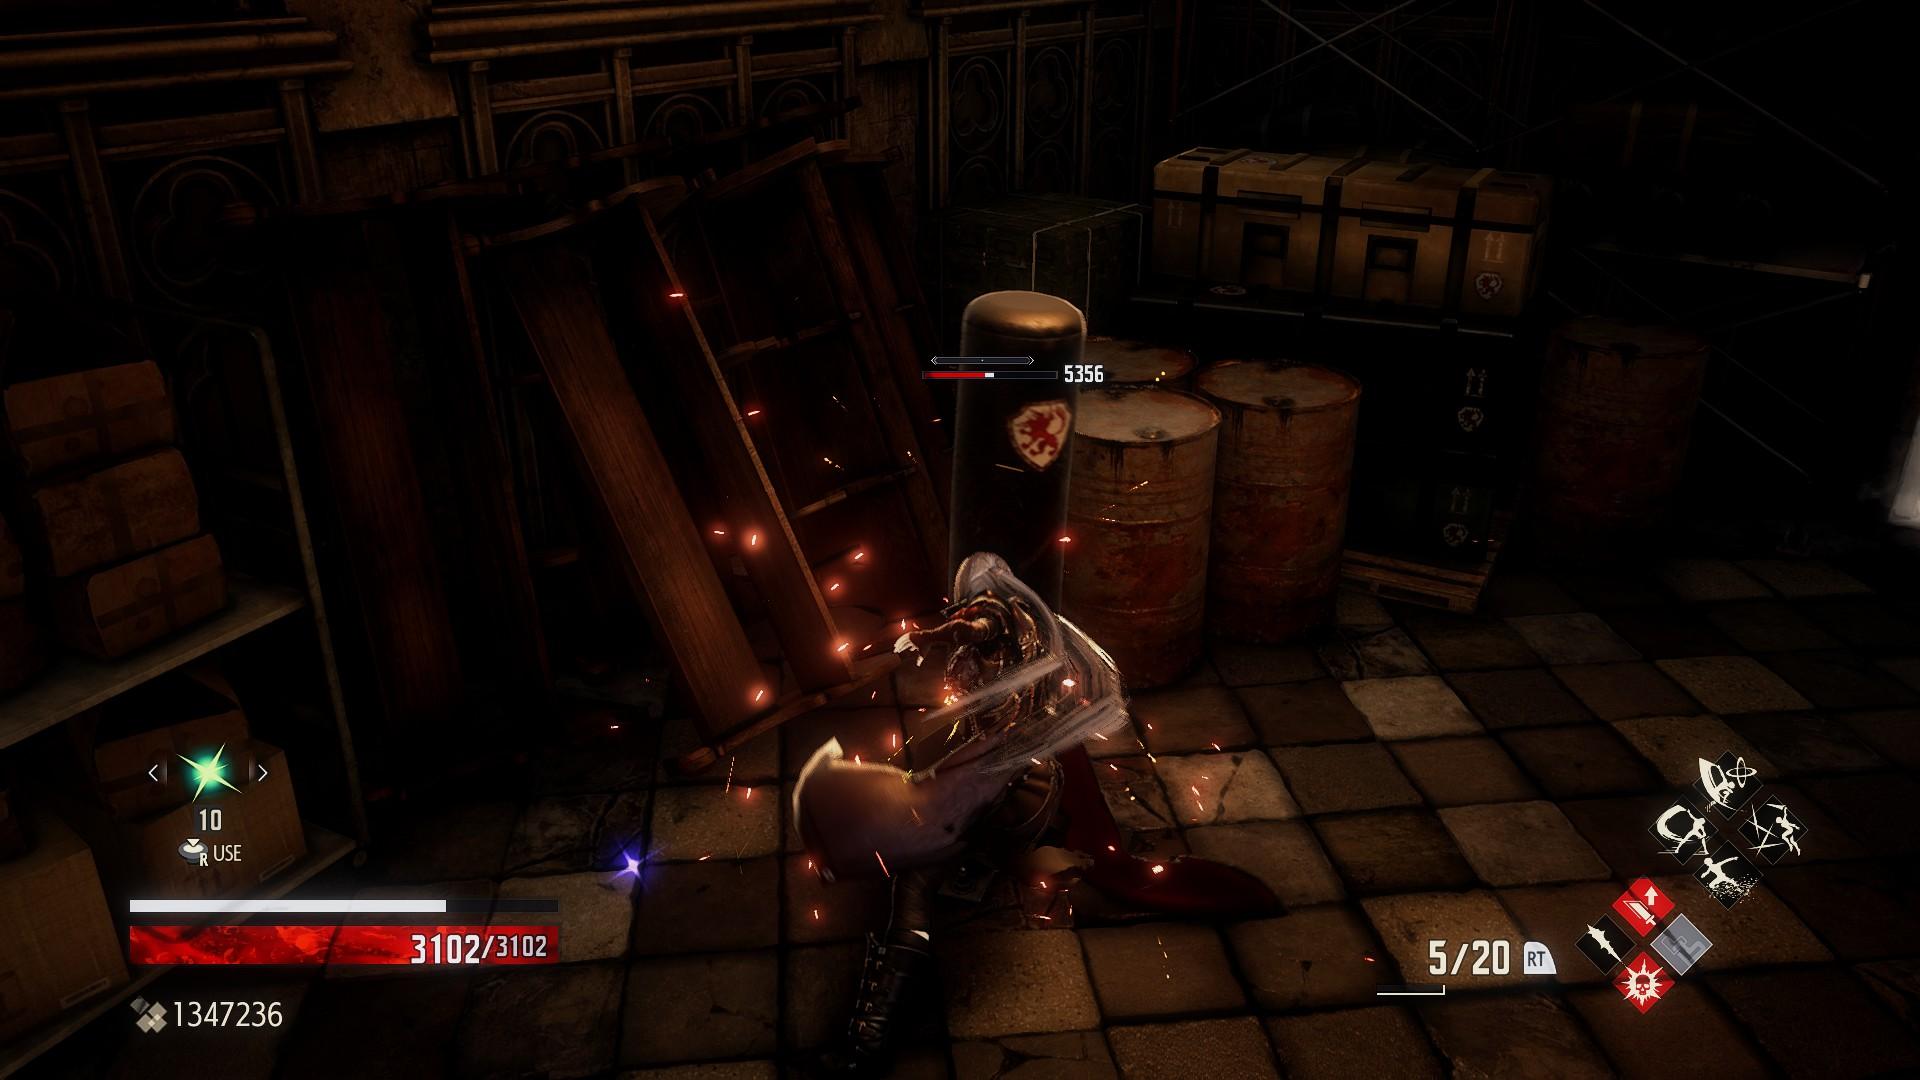 [PCゲーム]CODE VEIN:高難易度モードを楽しもう3